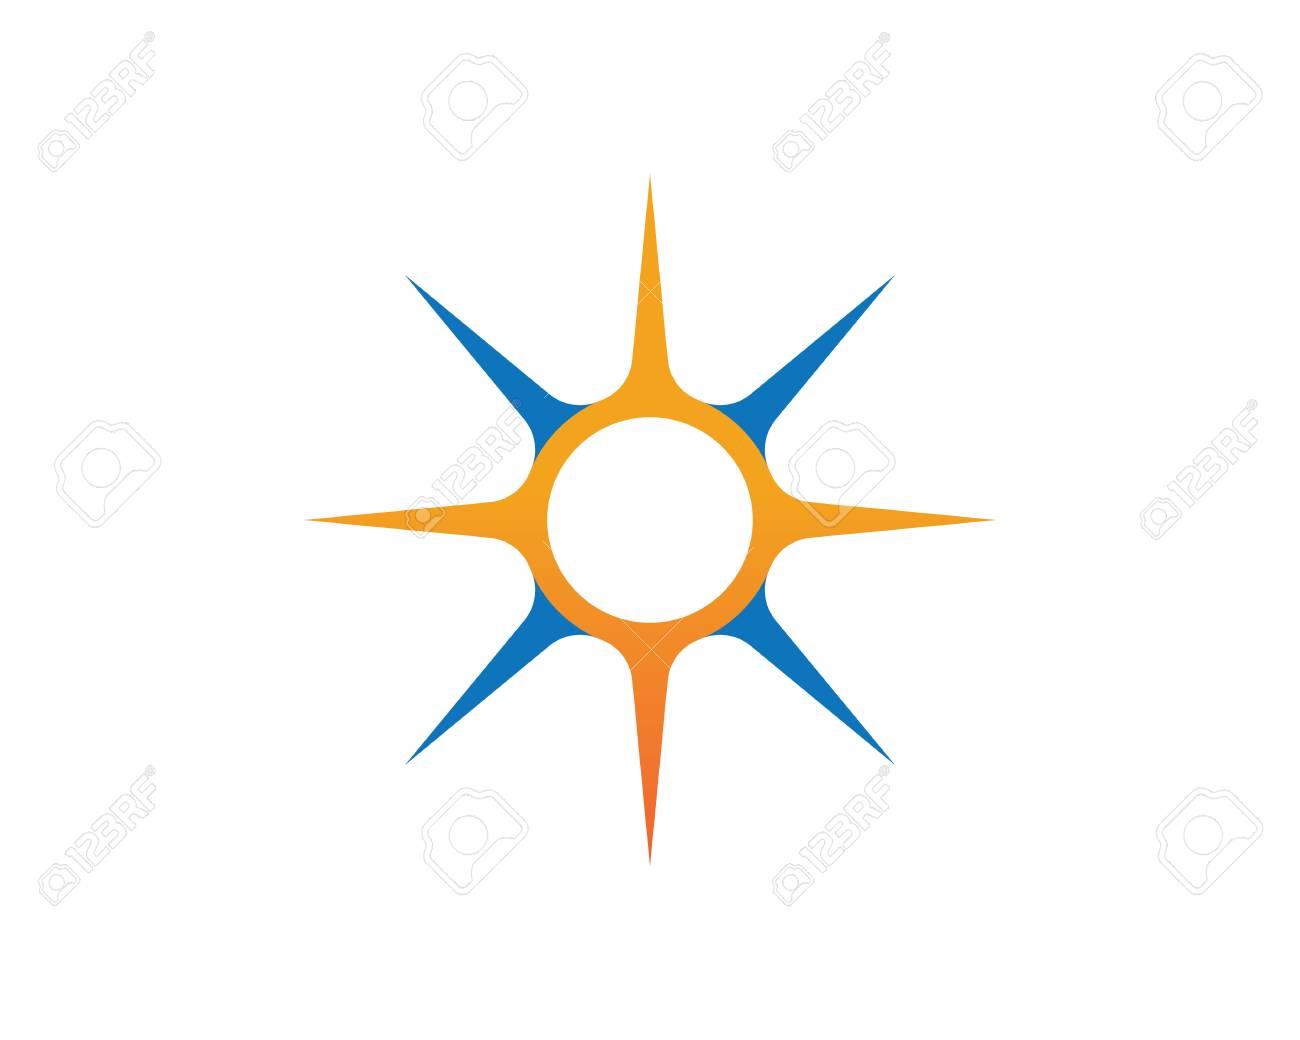 vector compass signs and symbols logo royalty free cliparts